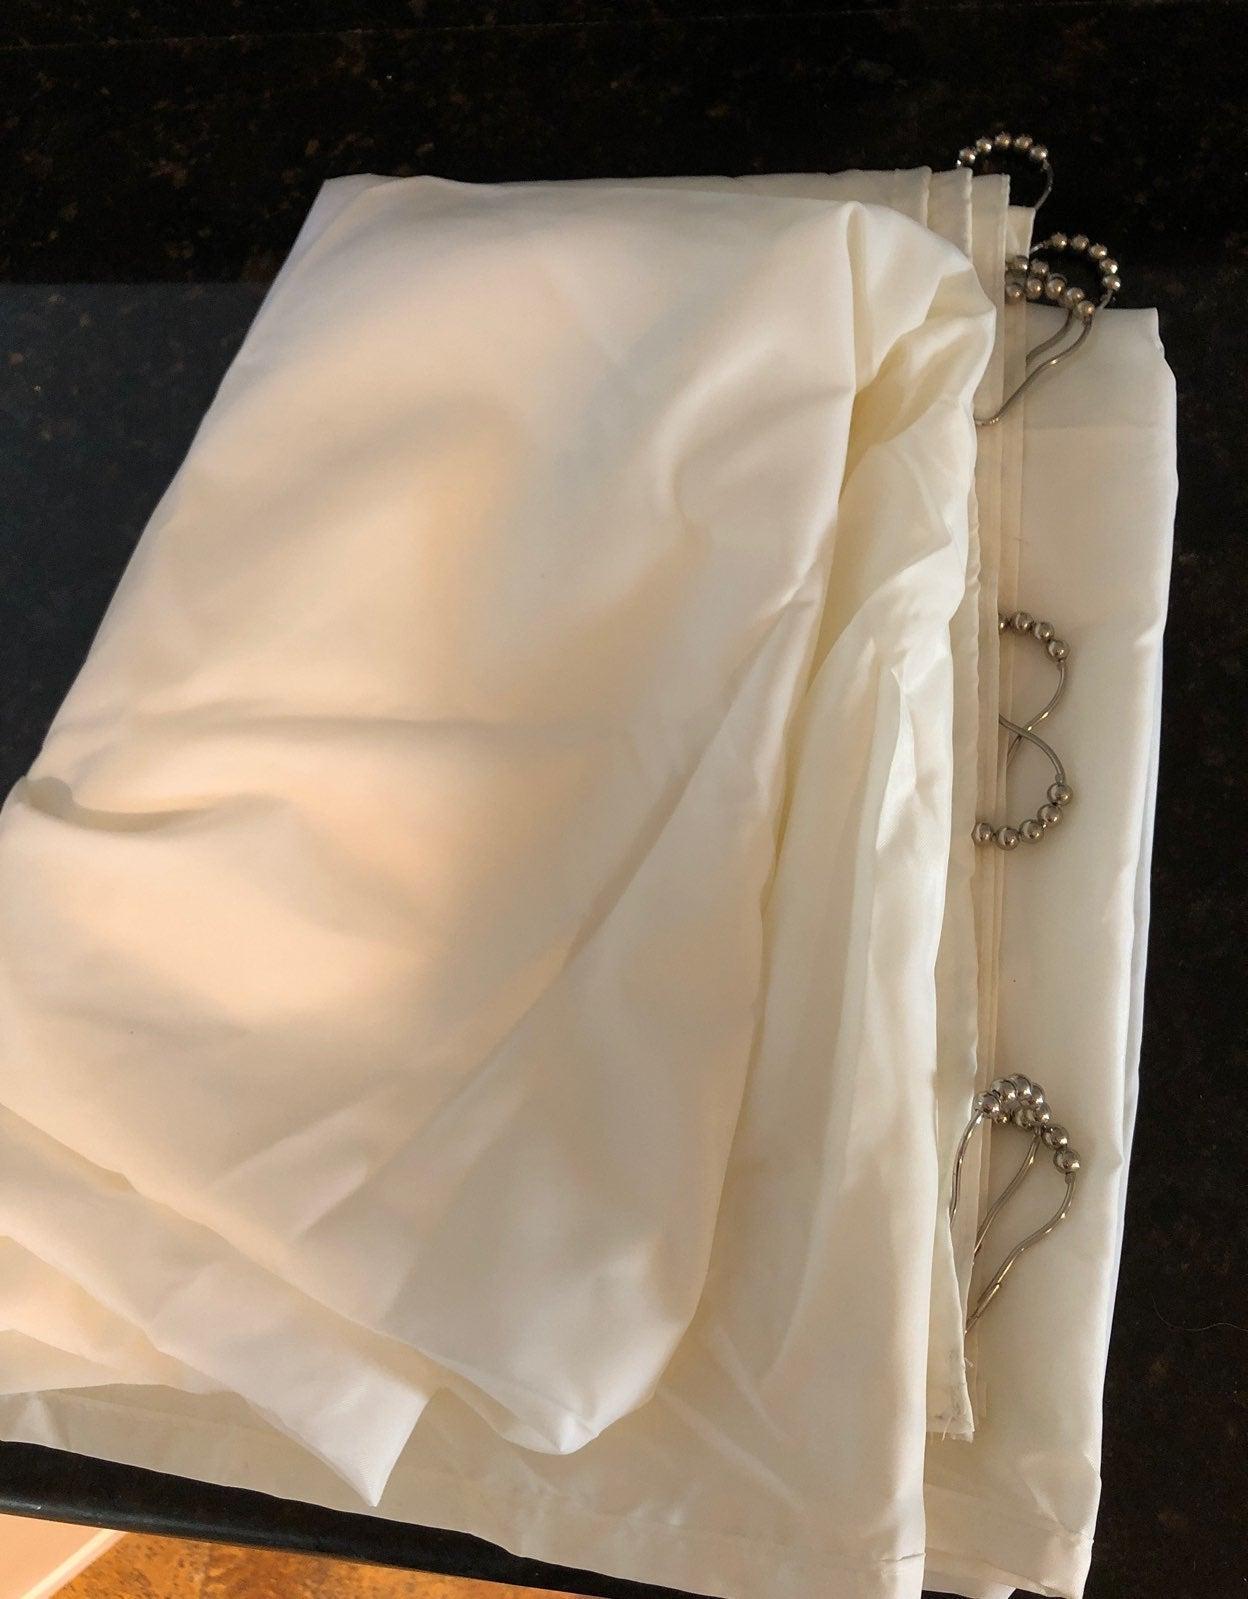 Cream Fabric Shower Curtain W/hangers